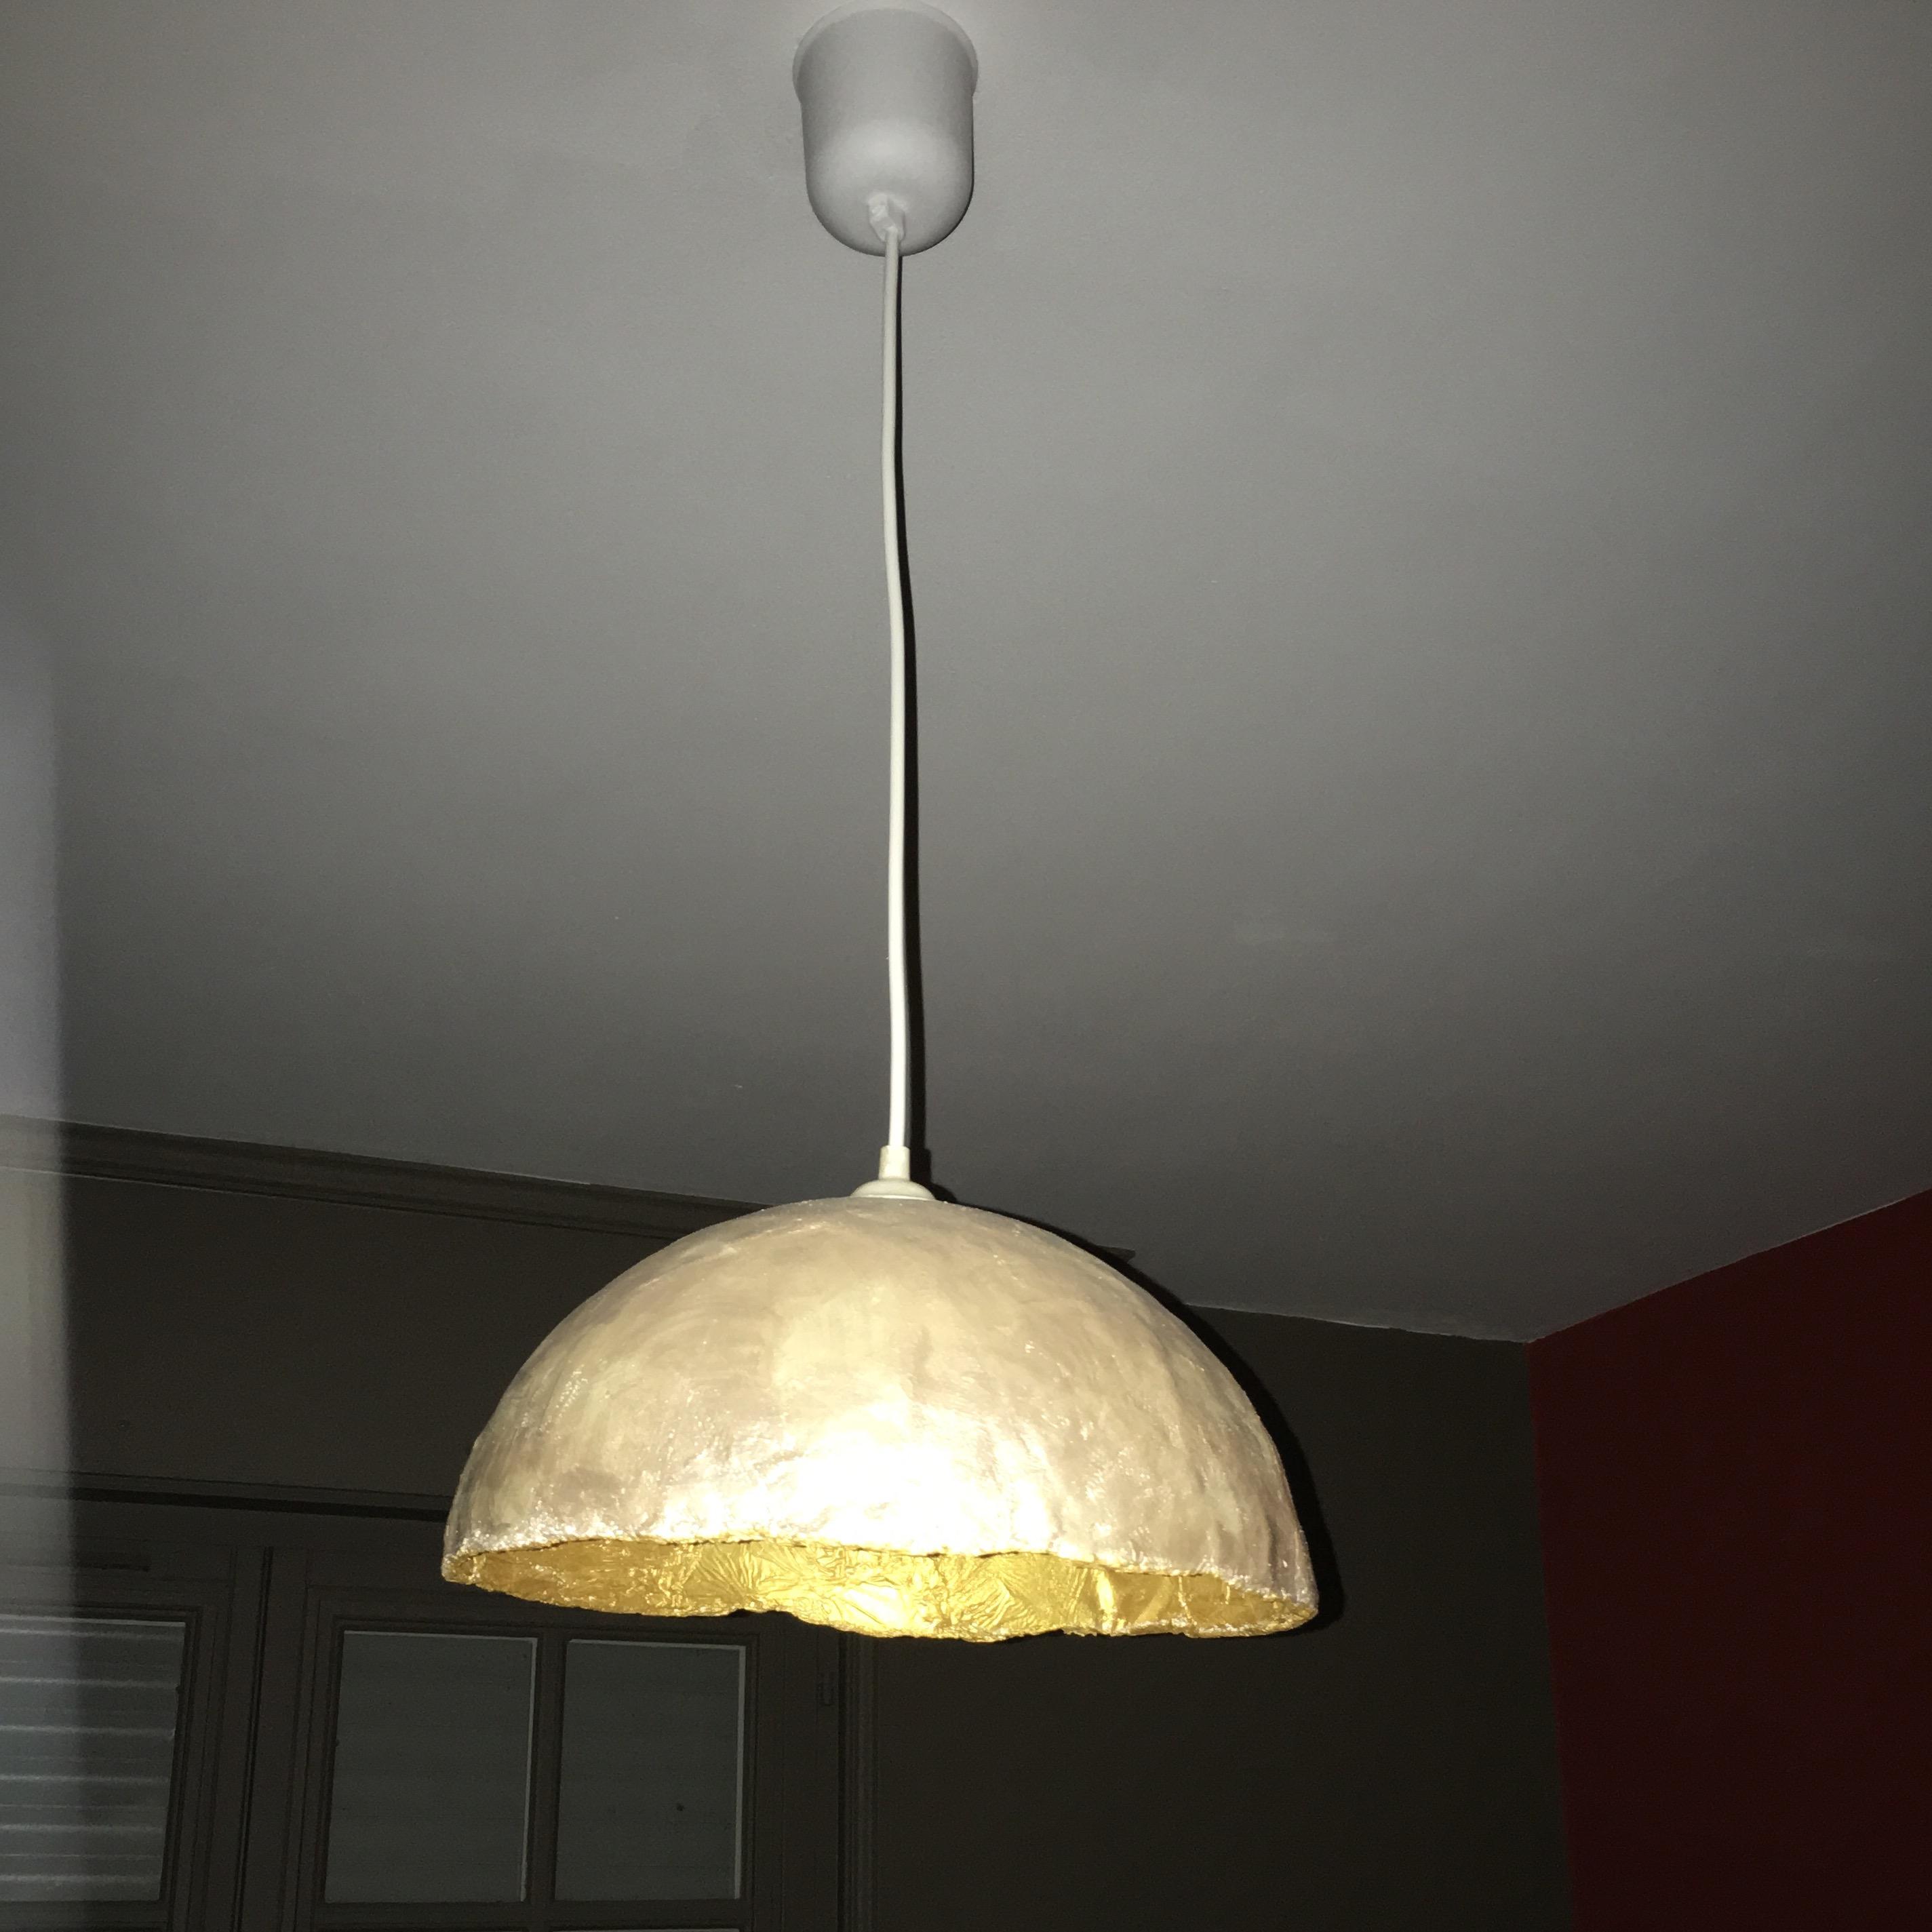 Luminaire Diy Suspension Diy Suspension Un Luminaire Solide La